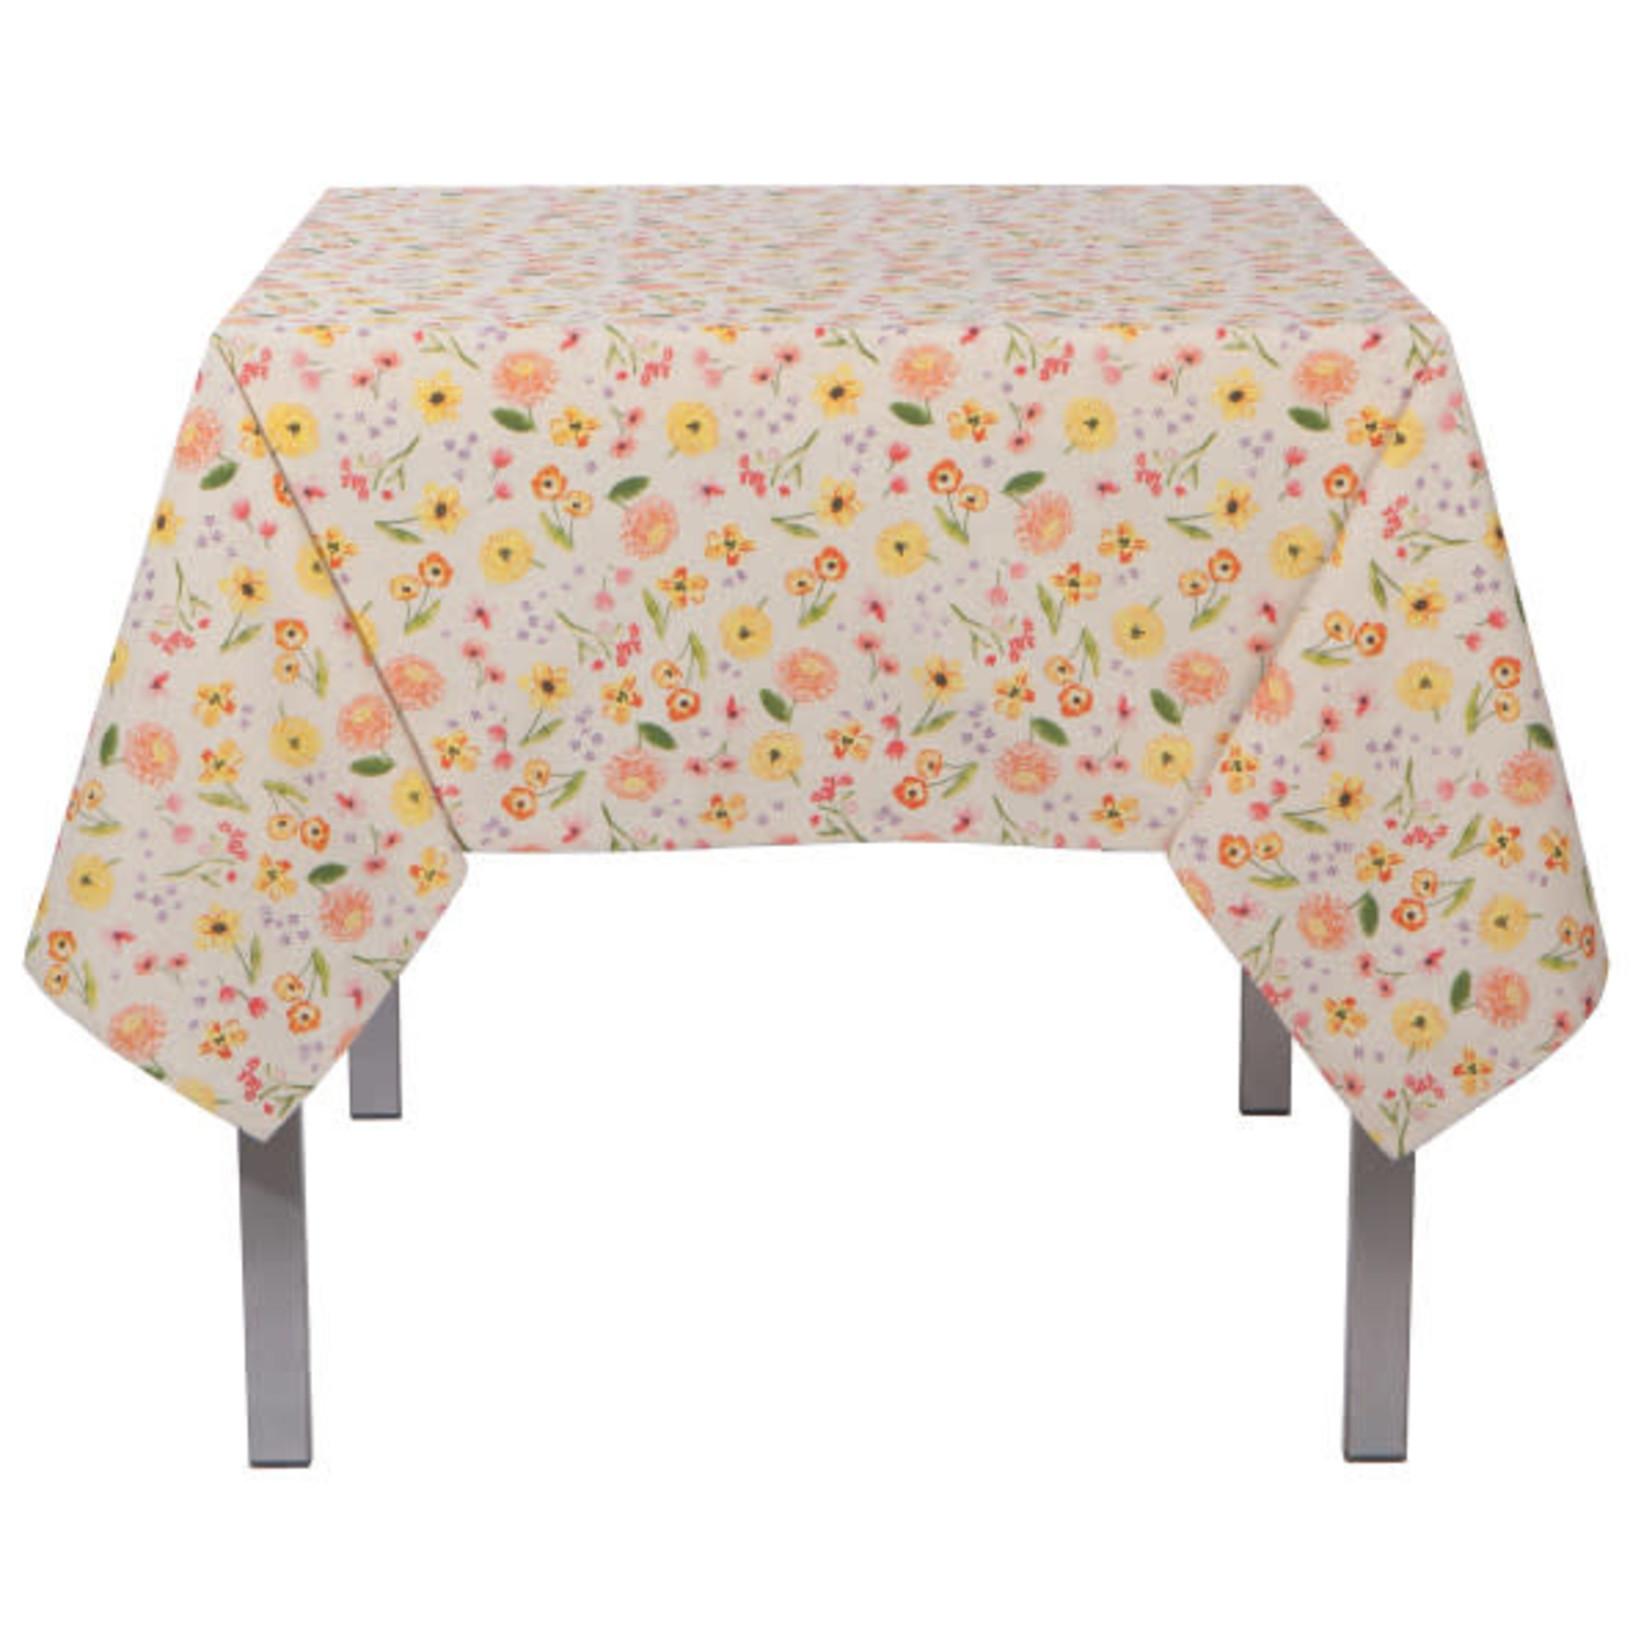 "Cottage Floral Tablecloth - 60 X 90"""